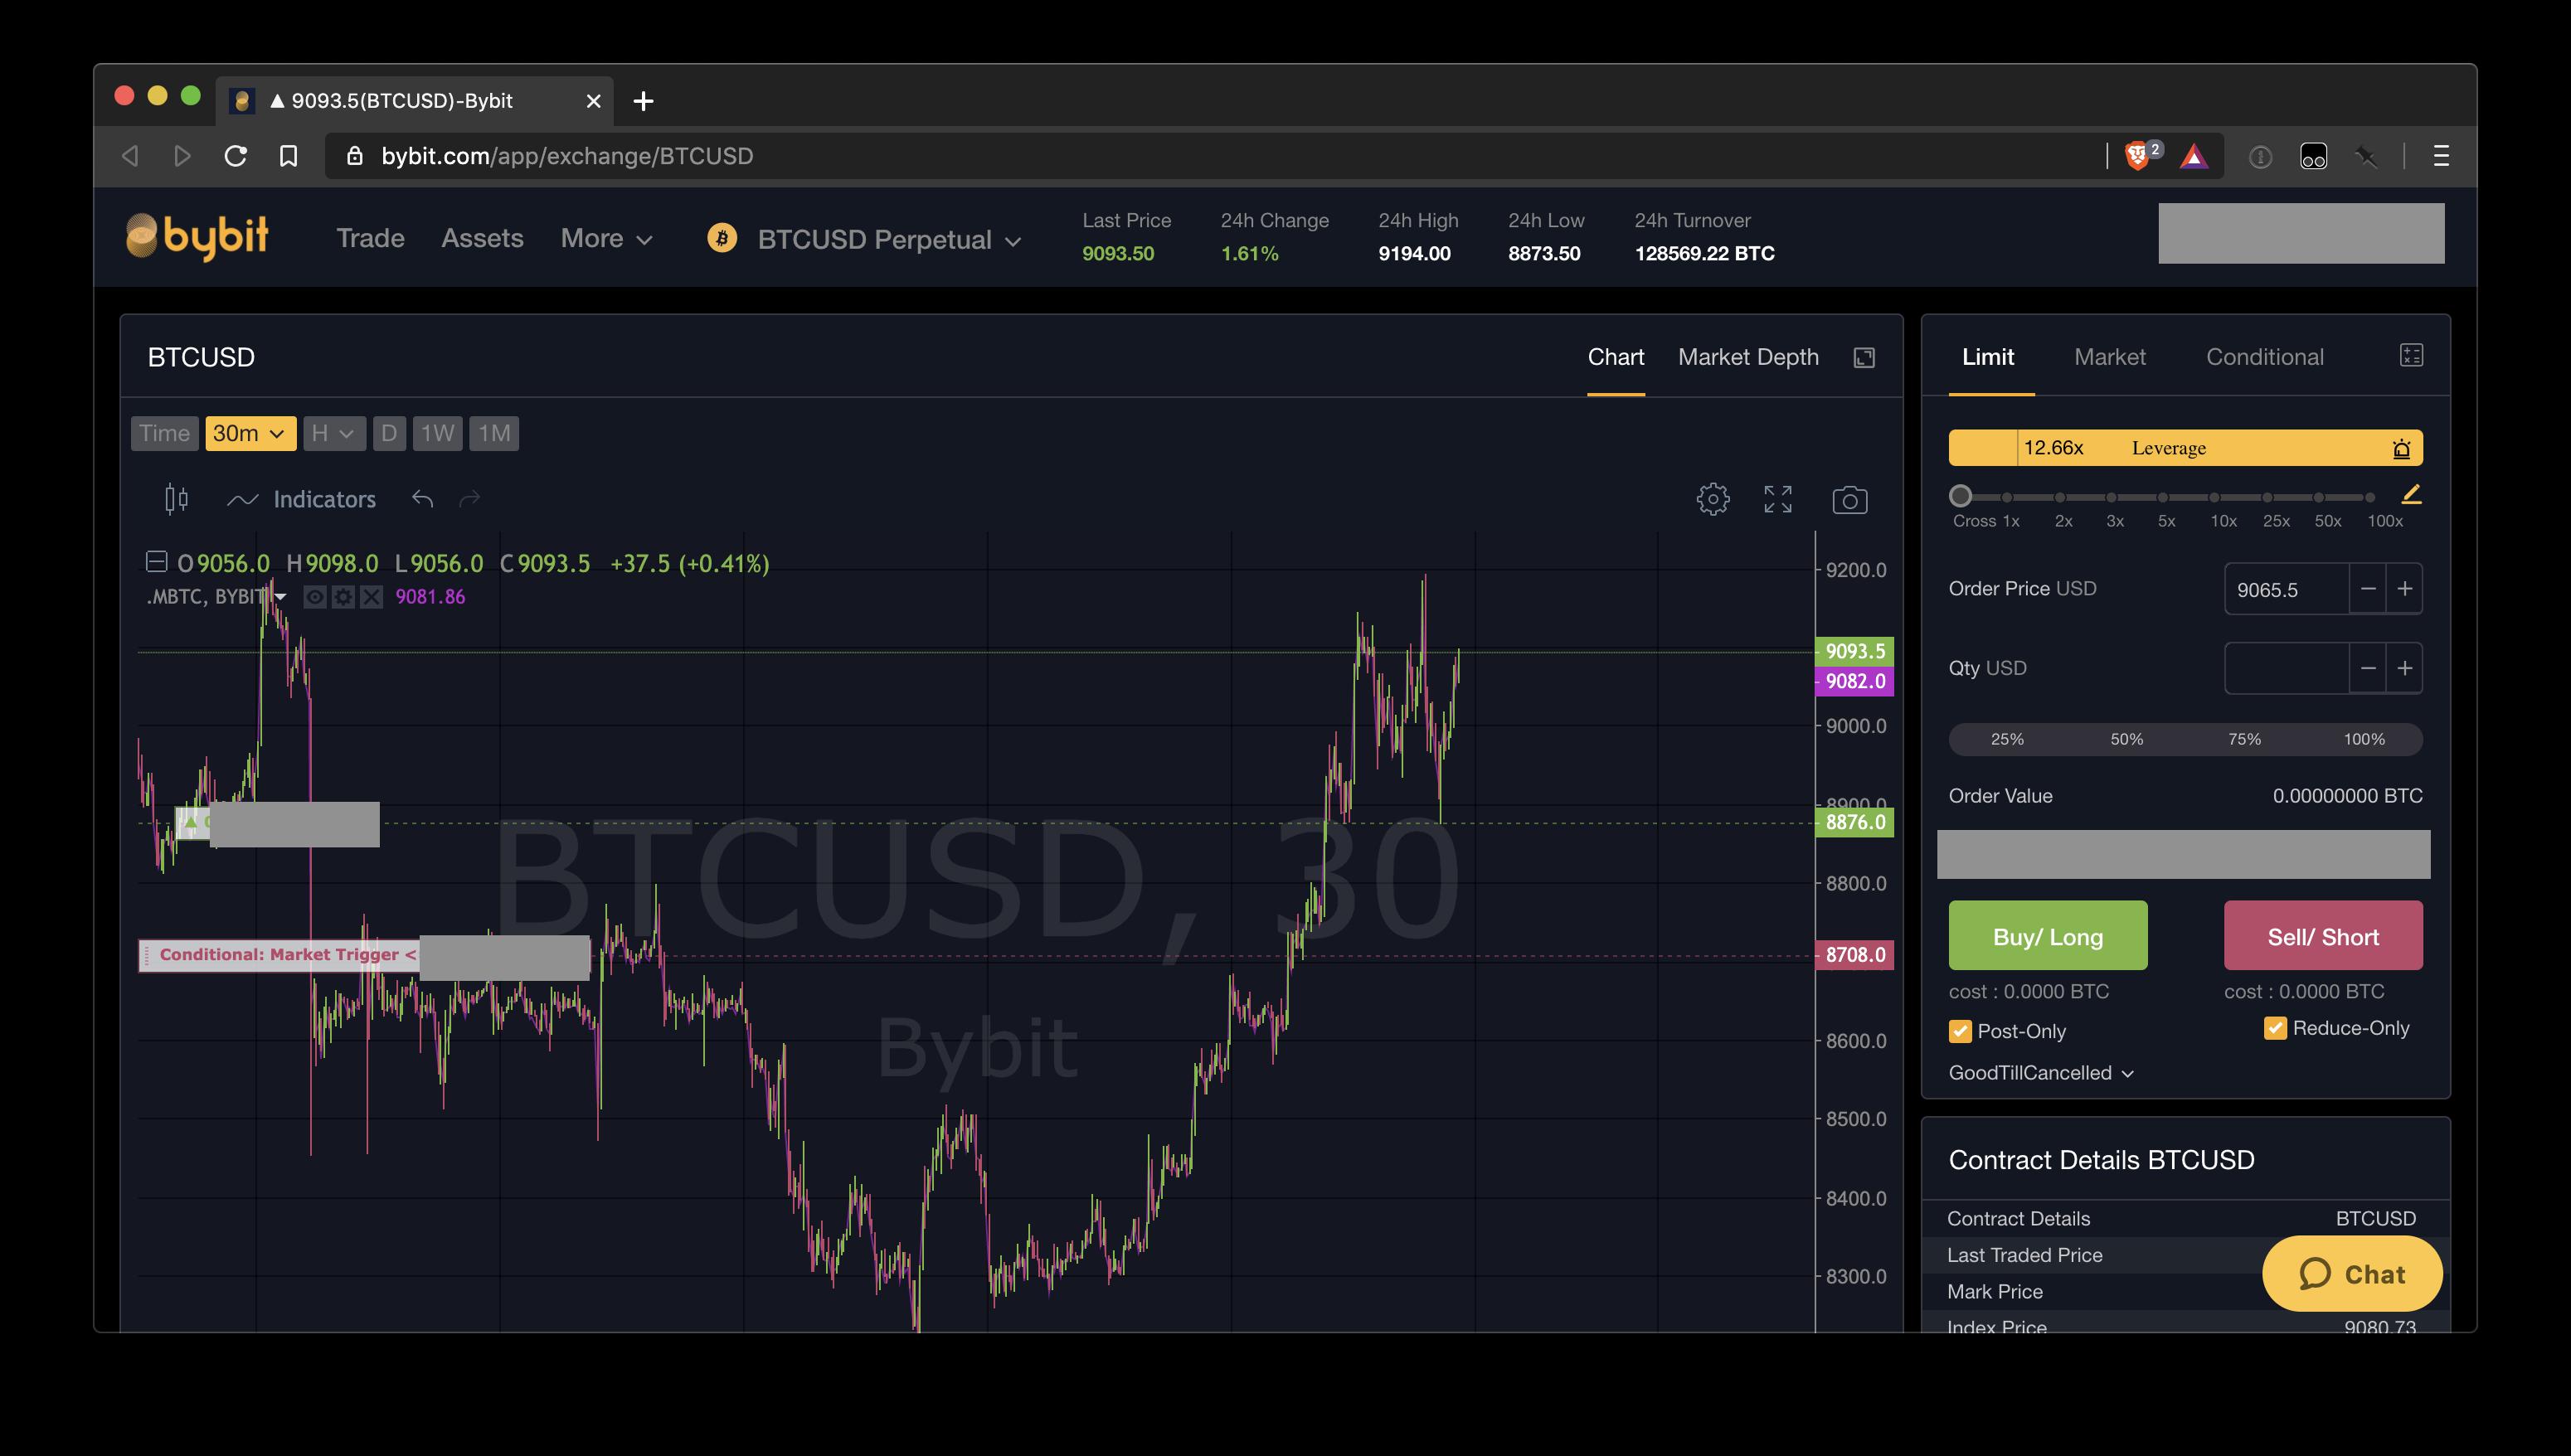 Screenshot-2020-01-28-16.13.48-squashed